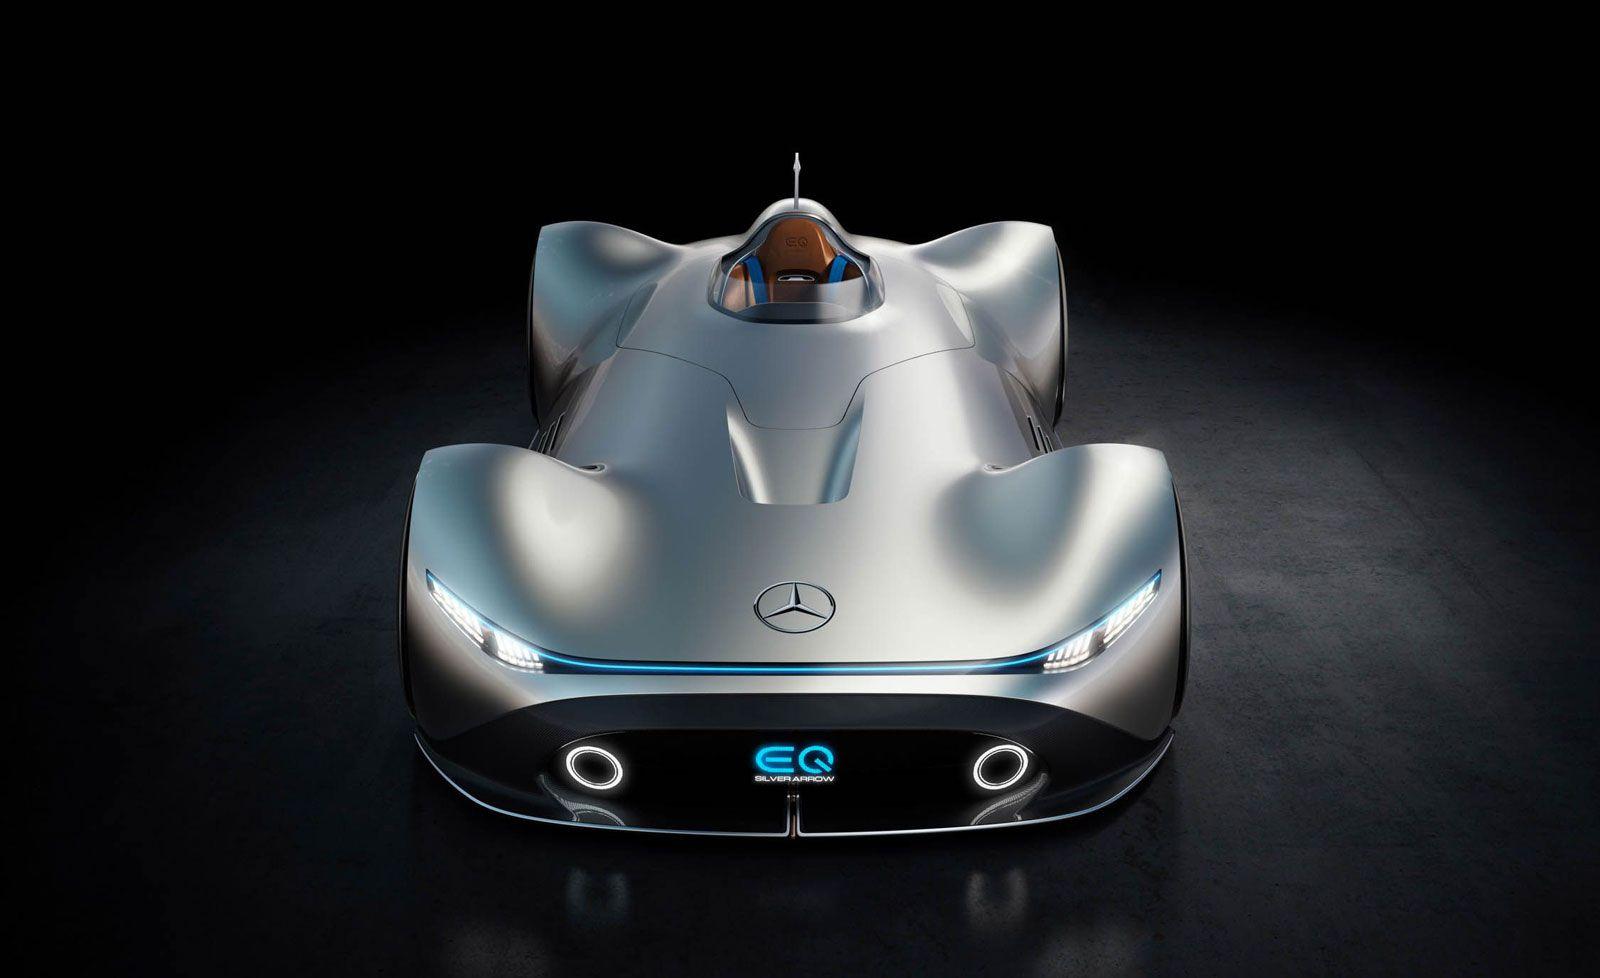 Mercedes Benz Vision Eq Silver Arrow Concept Design Render Benz Mercedes Benz Mercedes Car